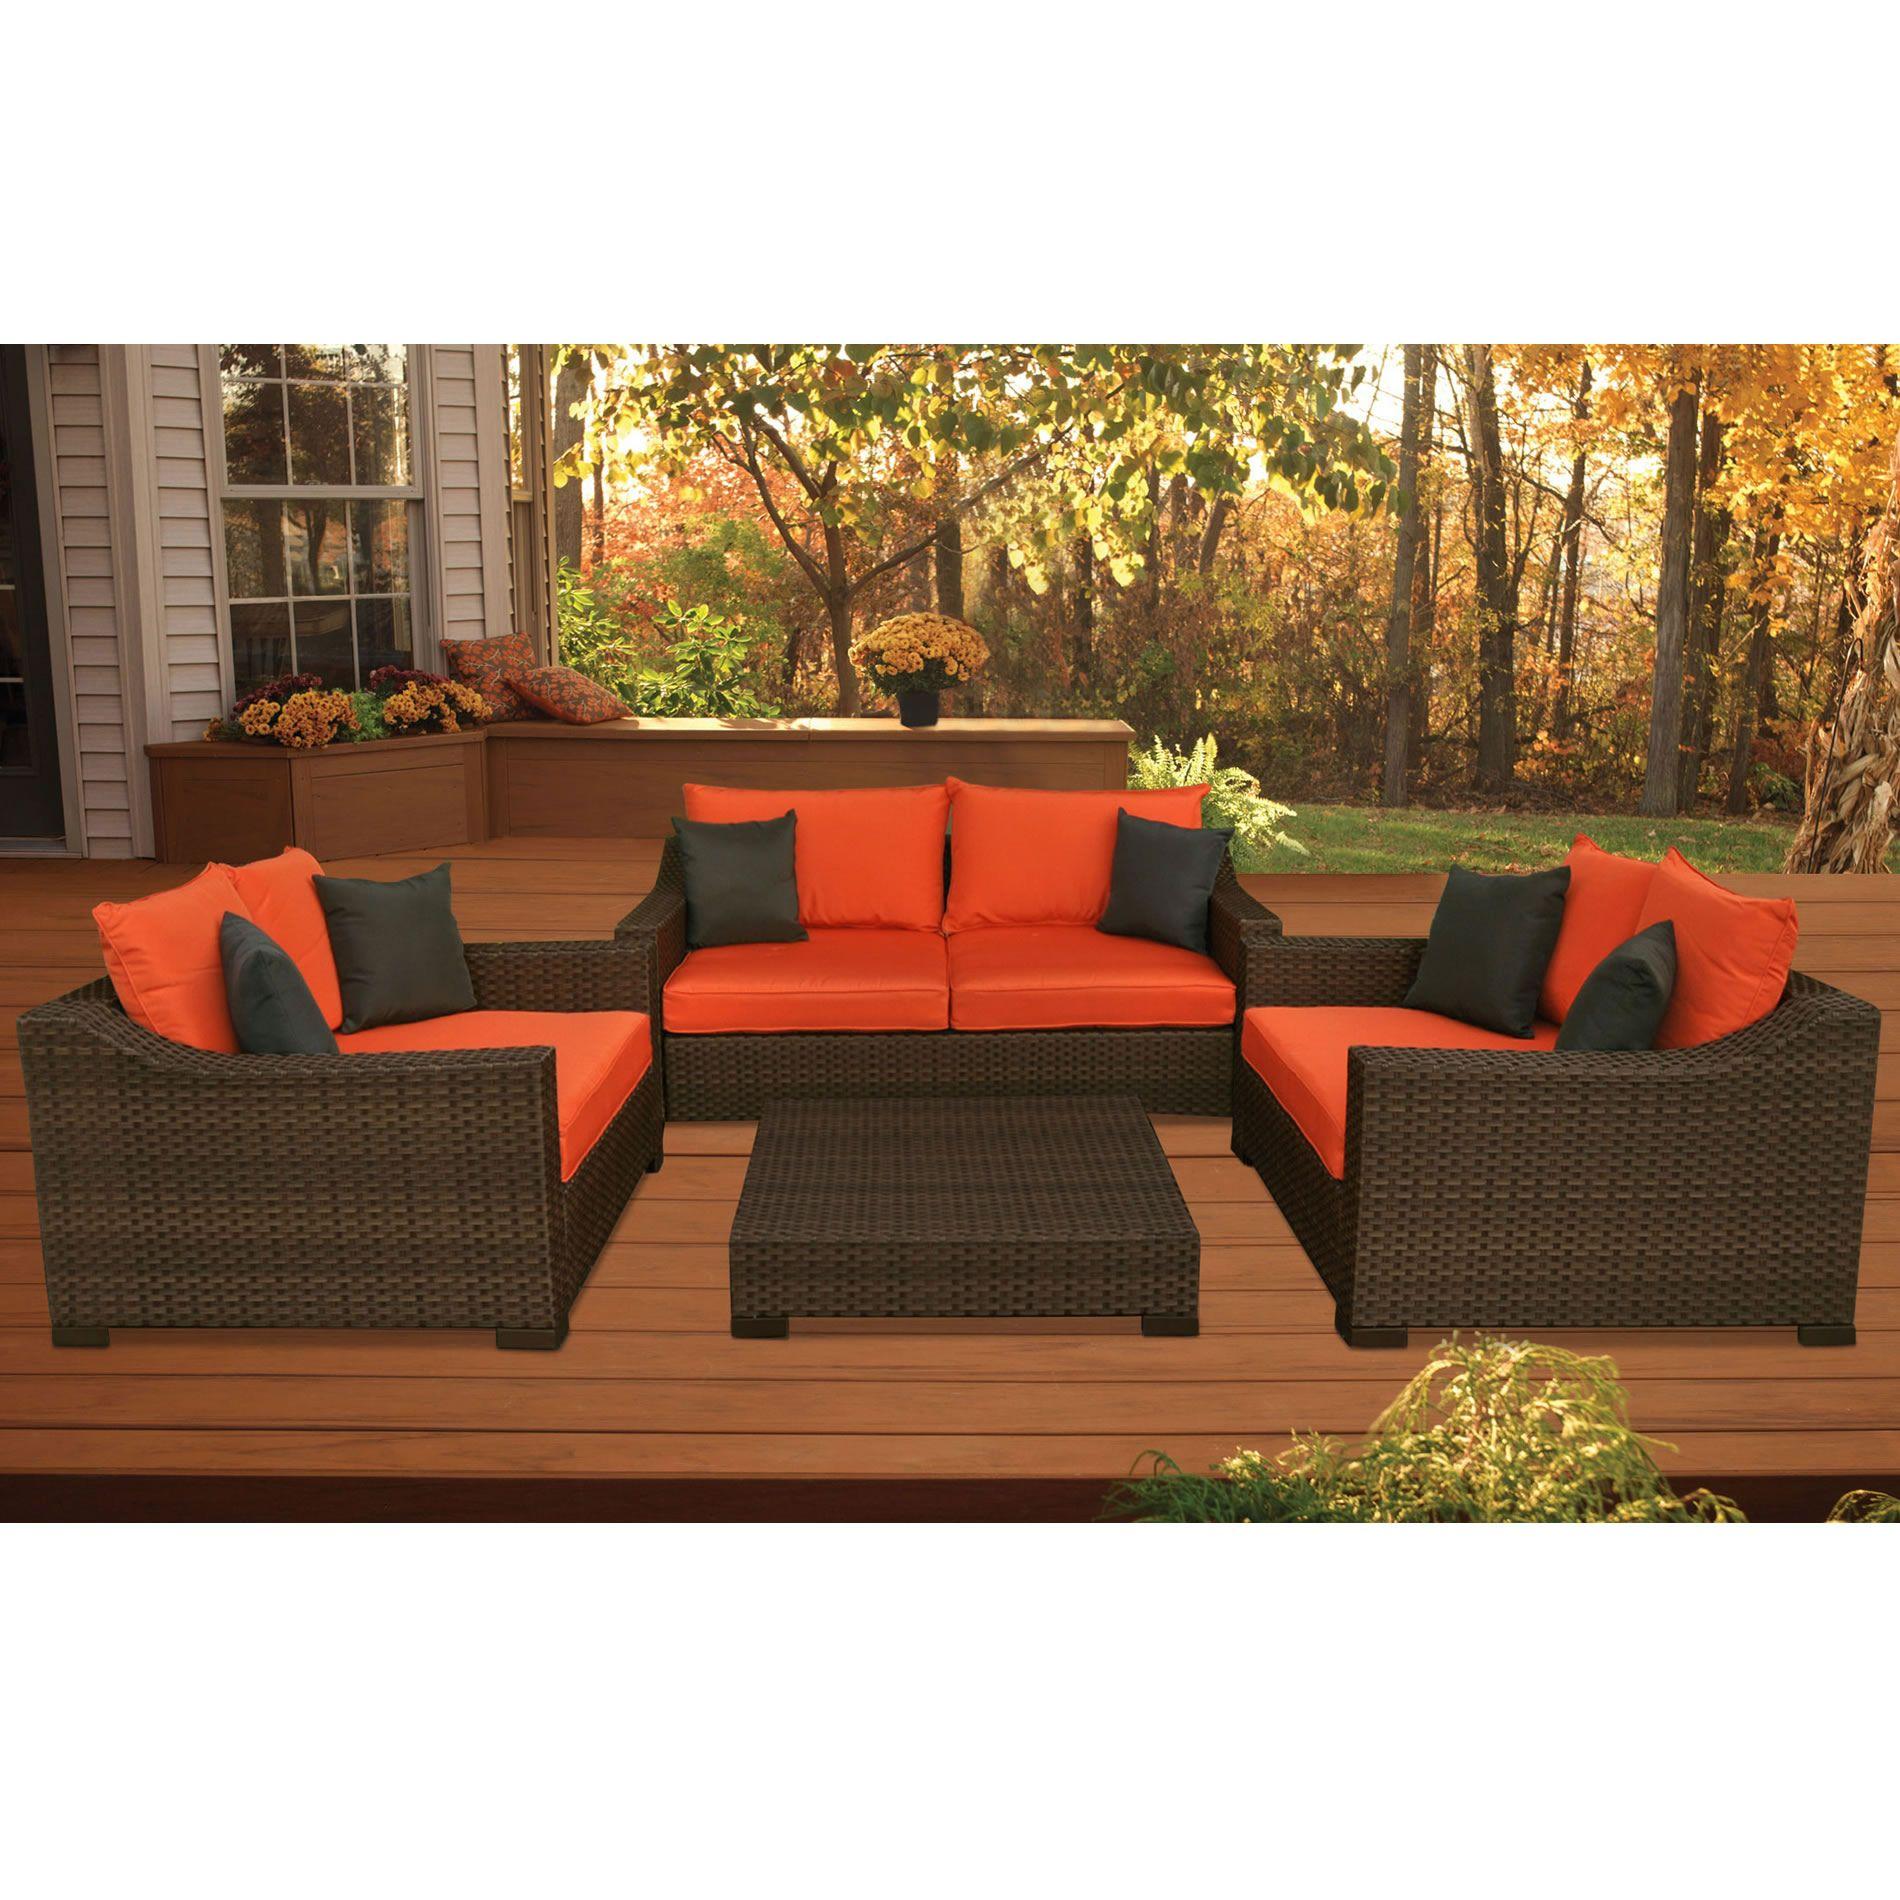 oxford 4 piece brown rattan effect sofa set bernhardt sofas discounted atlantic wellington synthetic wicker deep seating